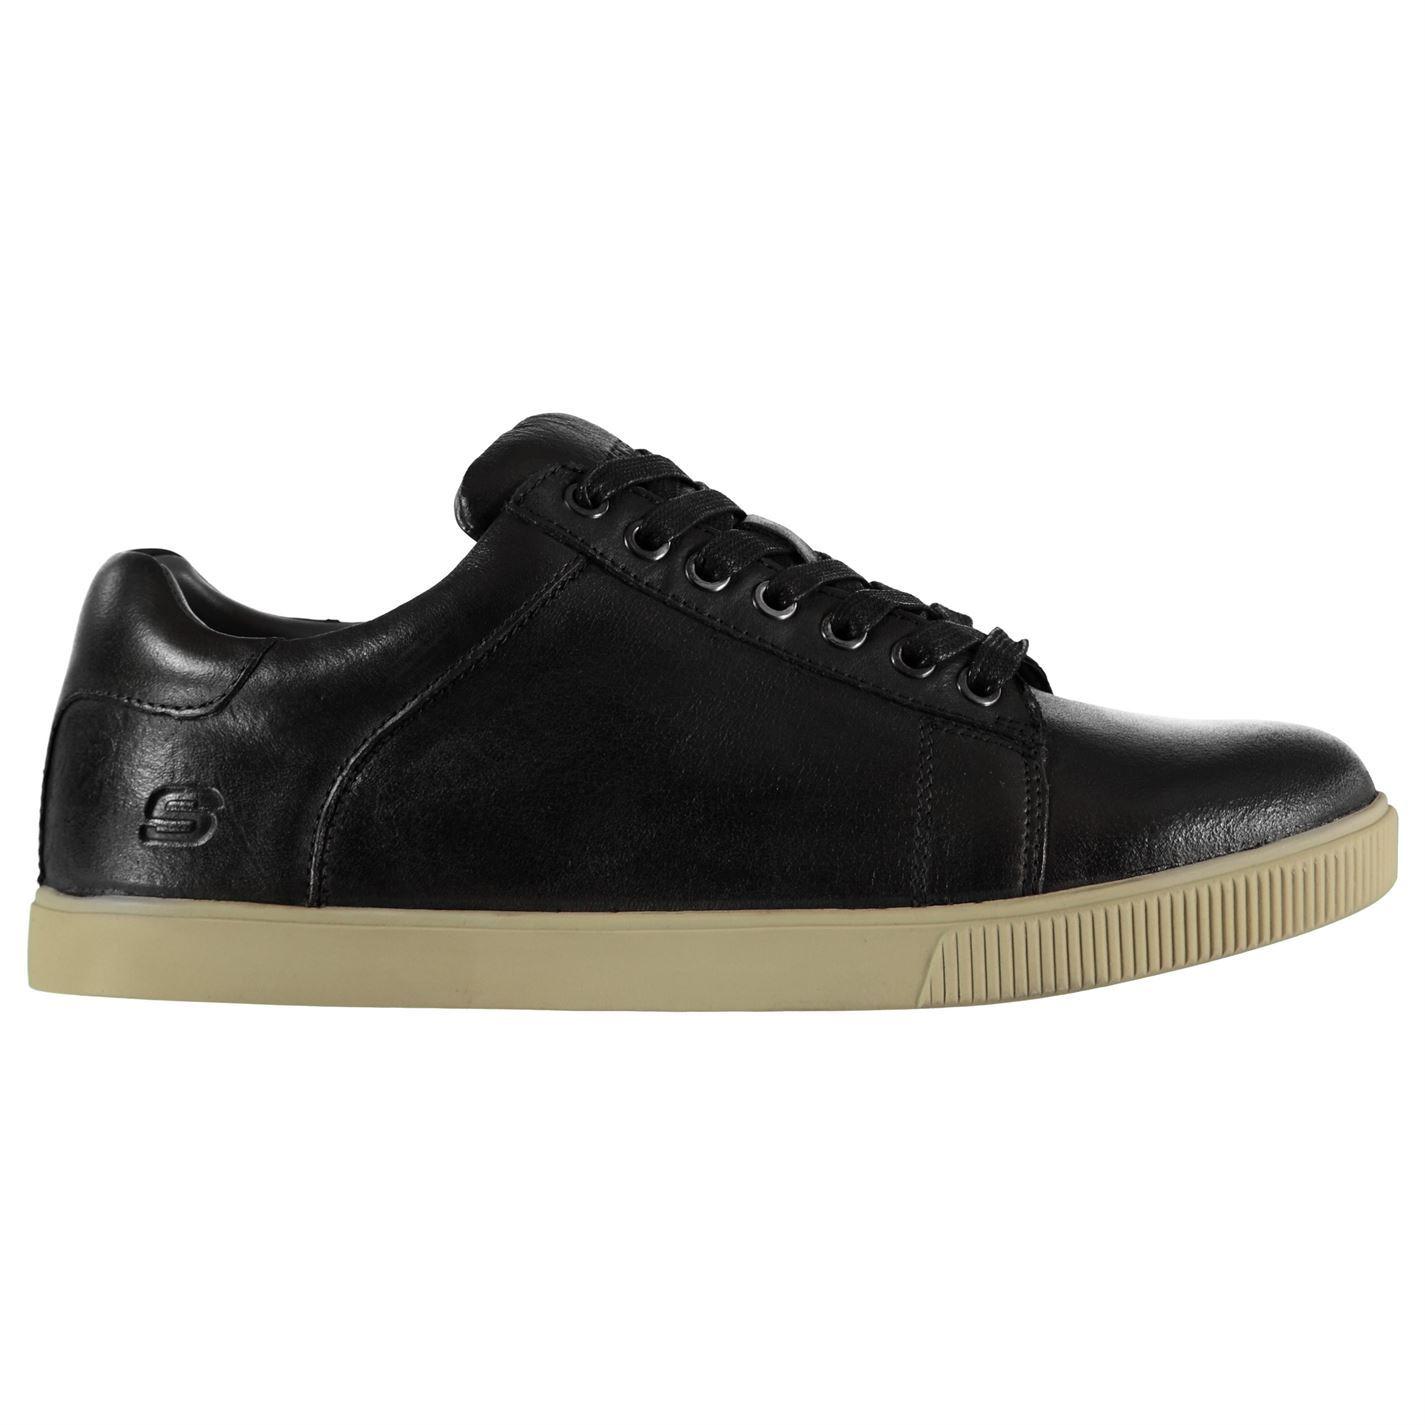 Skechers-Vol-Fandom-Homme-Chaussures-Baskets-decontractees-chaussures-baskets miniature 7